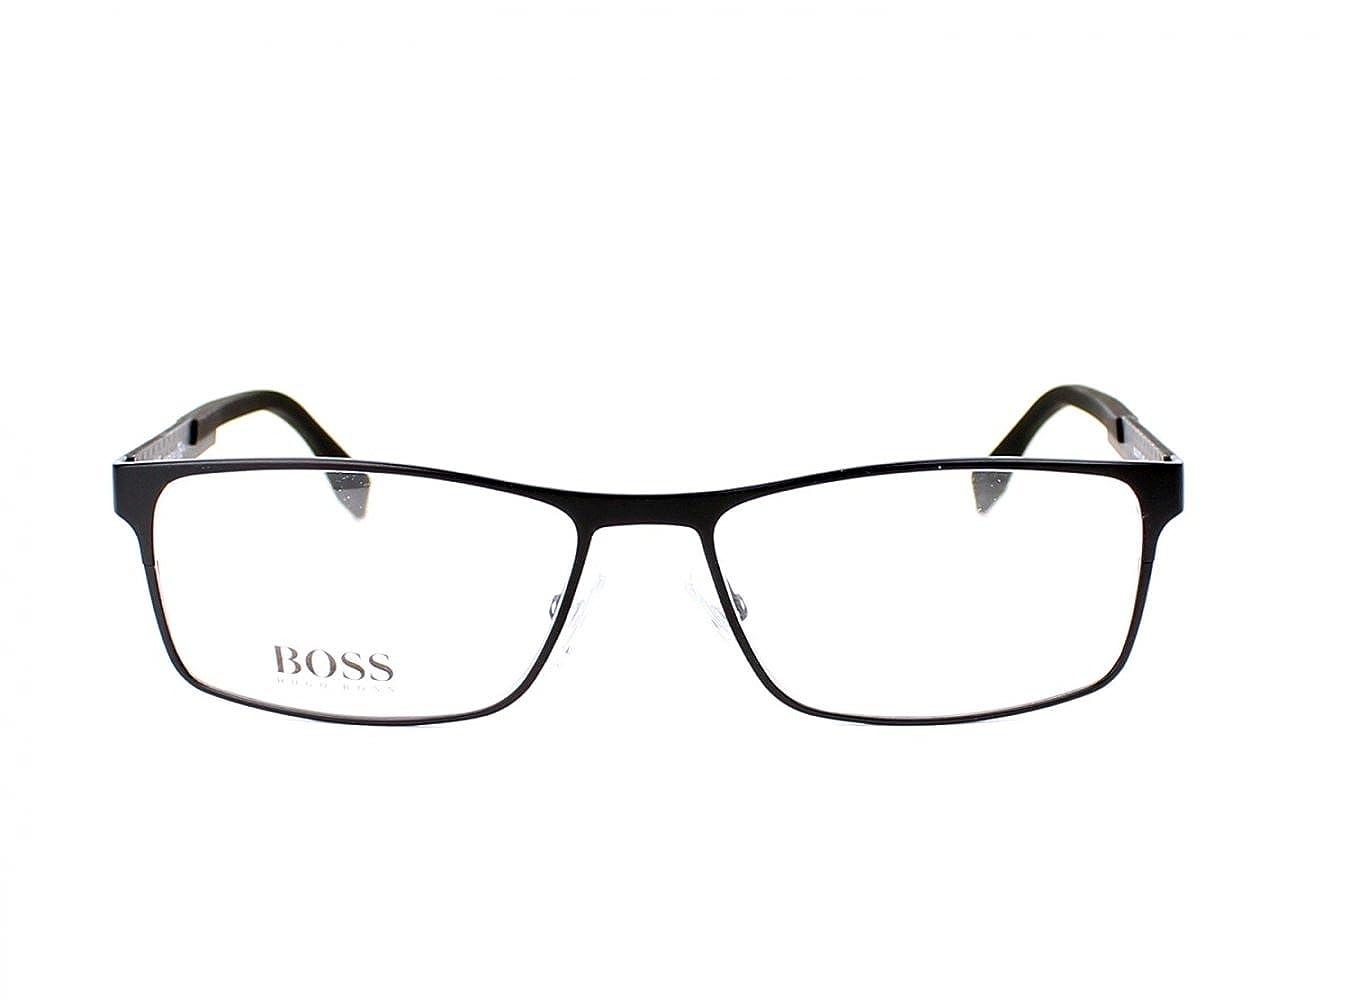 888afeb2f93 Amazon.com  Hugo Boss frame (BOSS-0775 HXE) Metal Matt Black - Carbon   Clothing